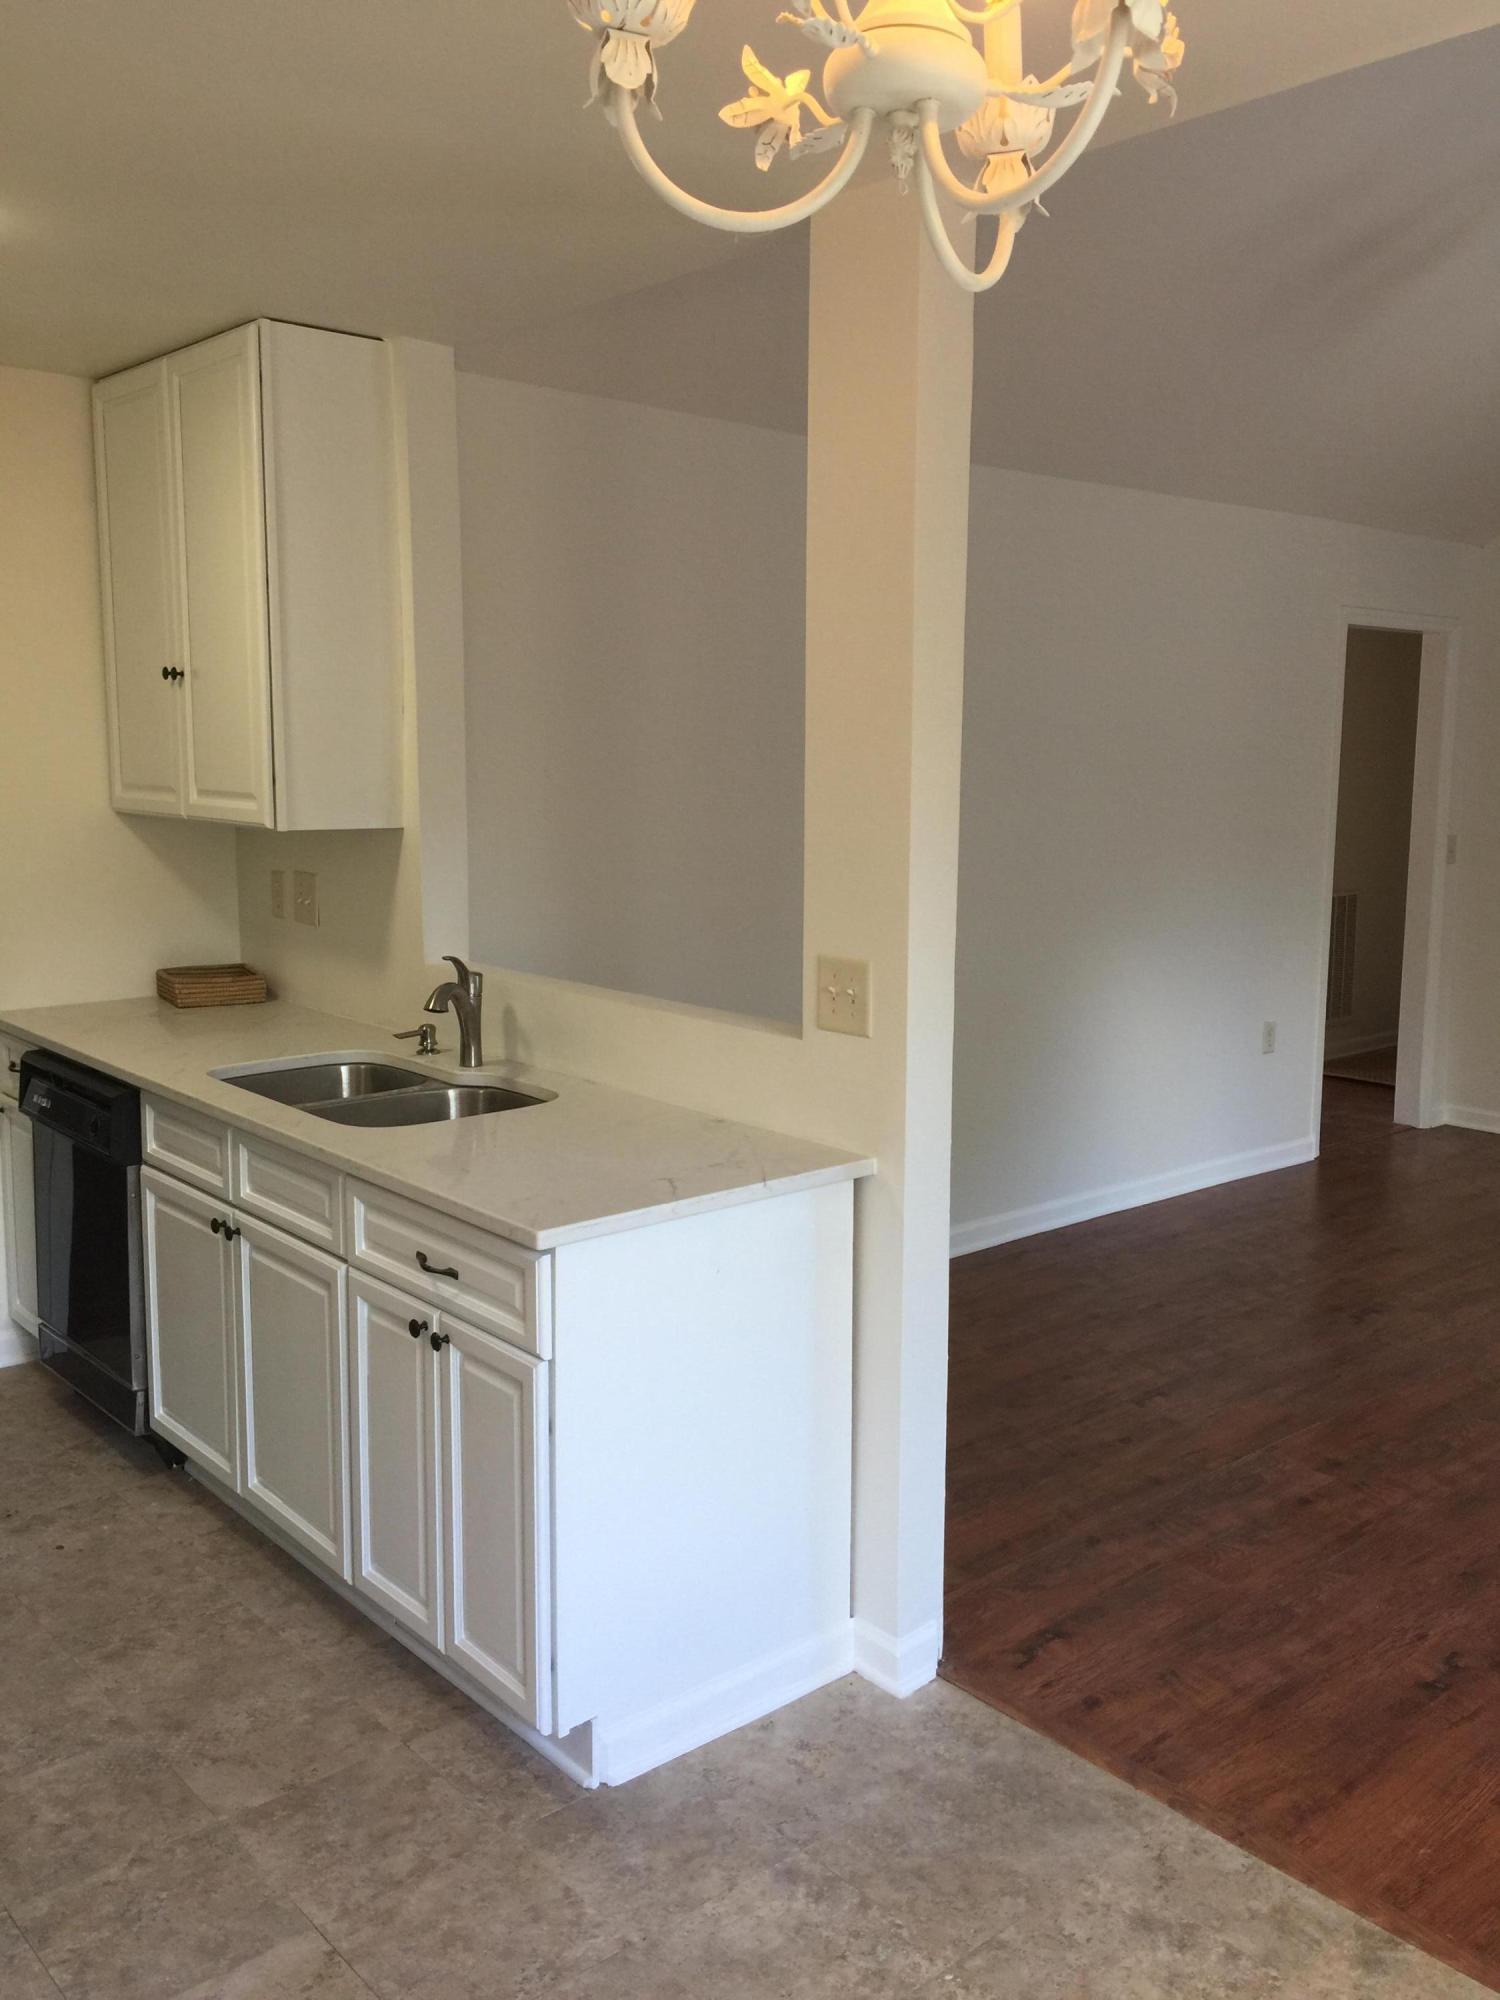 Quail Run Homes For Sale - 1202 Chicorie, Charleston, SC - 12